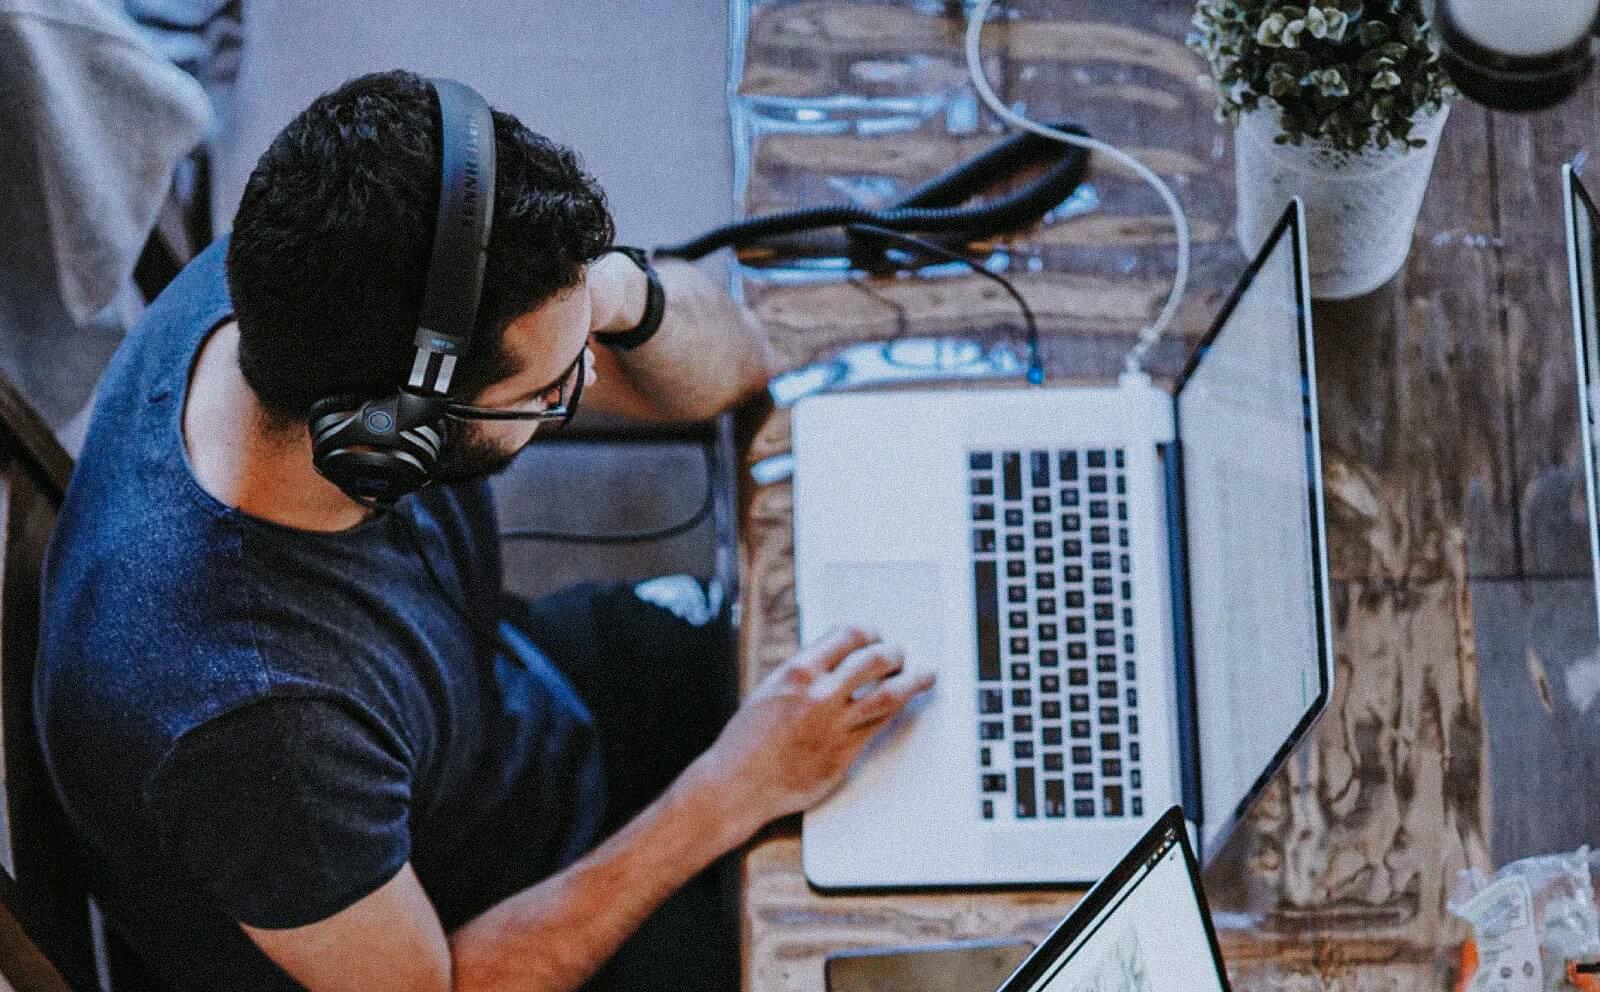 UX Designer working on his laptop